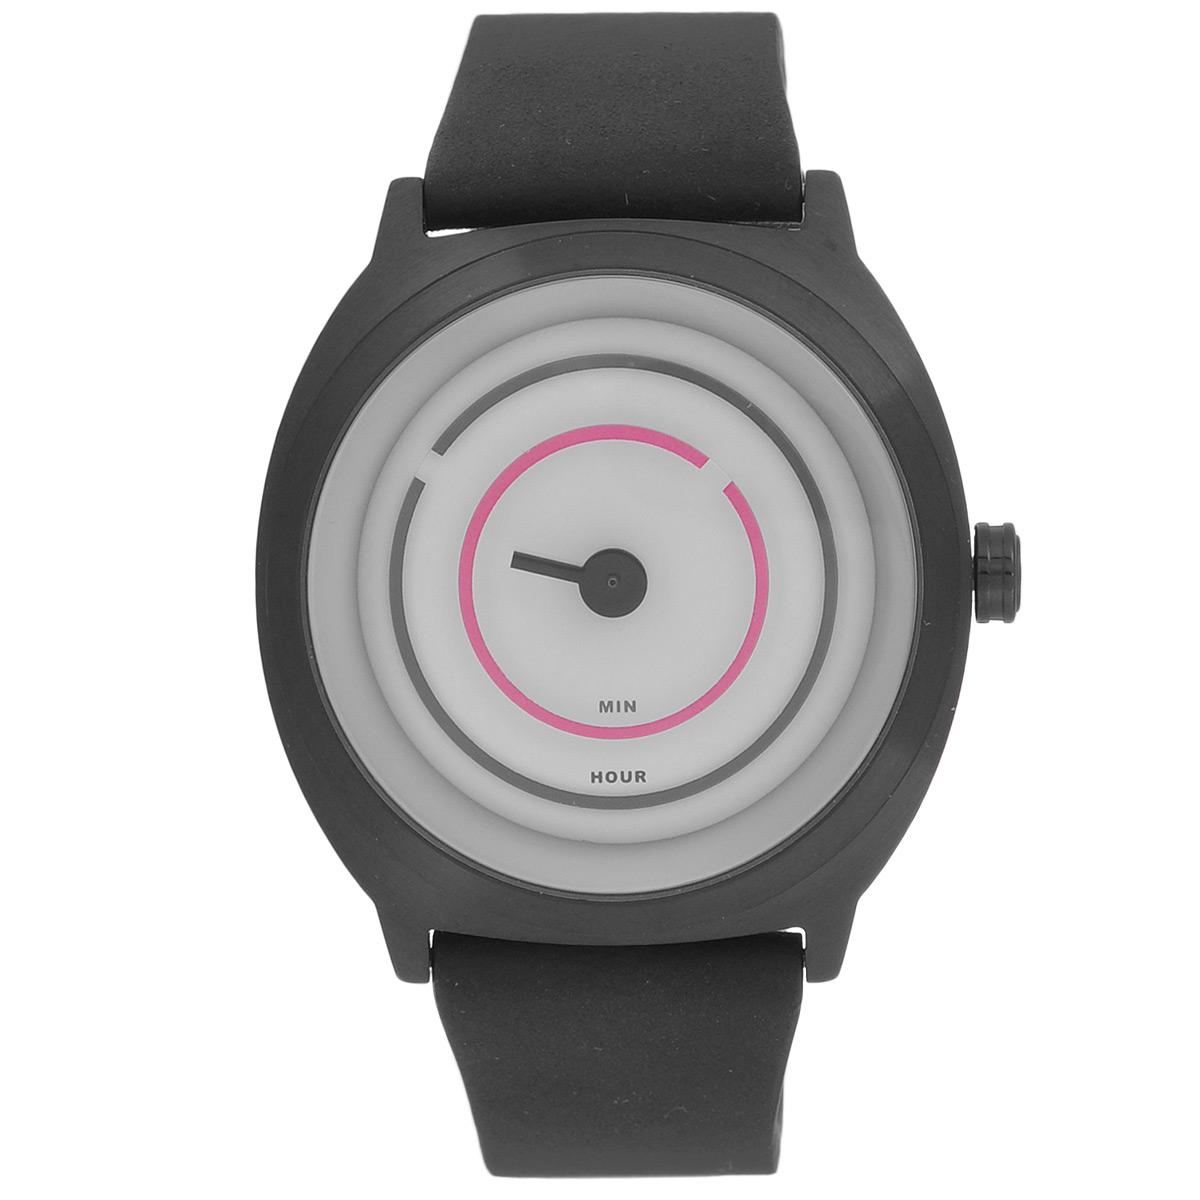 "Часы наручные женские Tacs ""TFO-D-A"", цвет: черный, белый, фуксия. TS1203A ( TS1203A )"